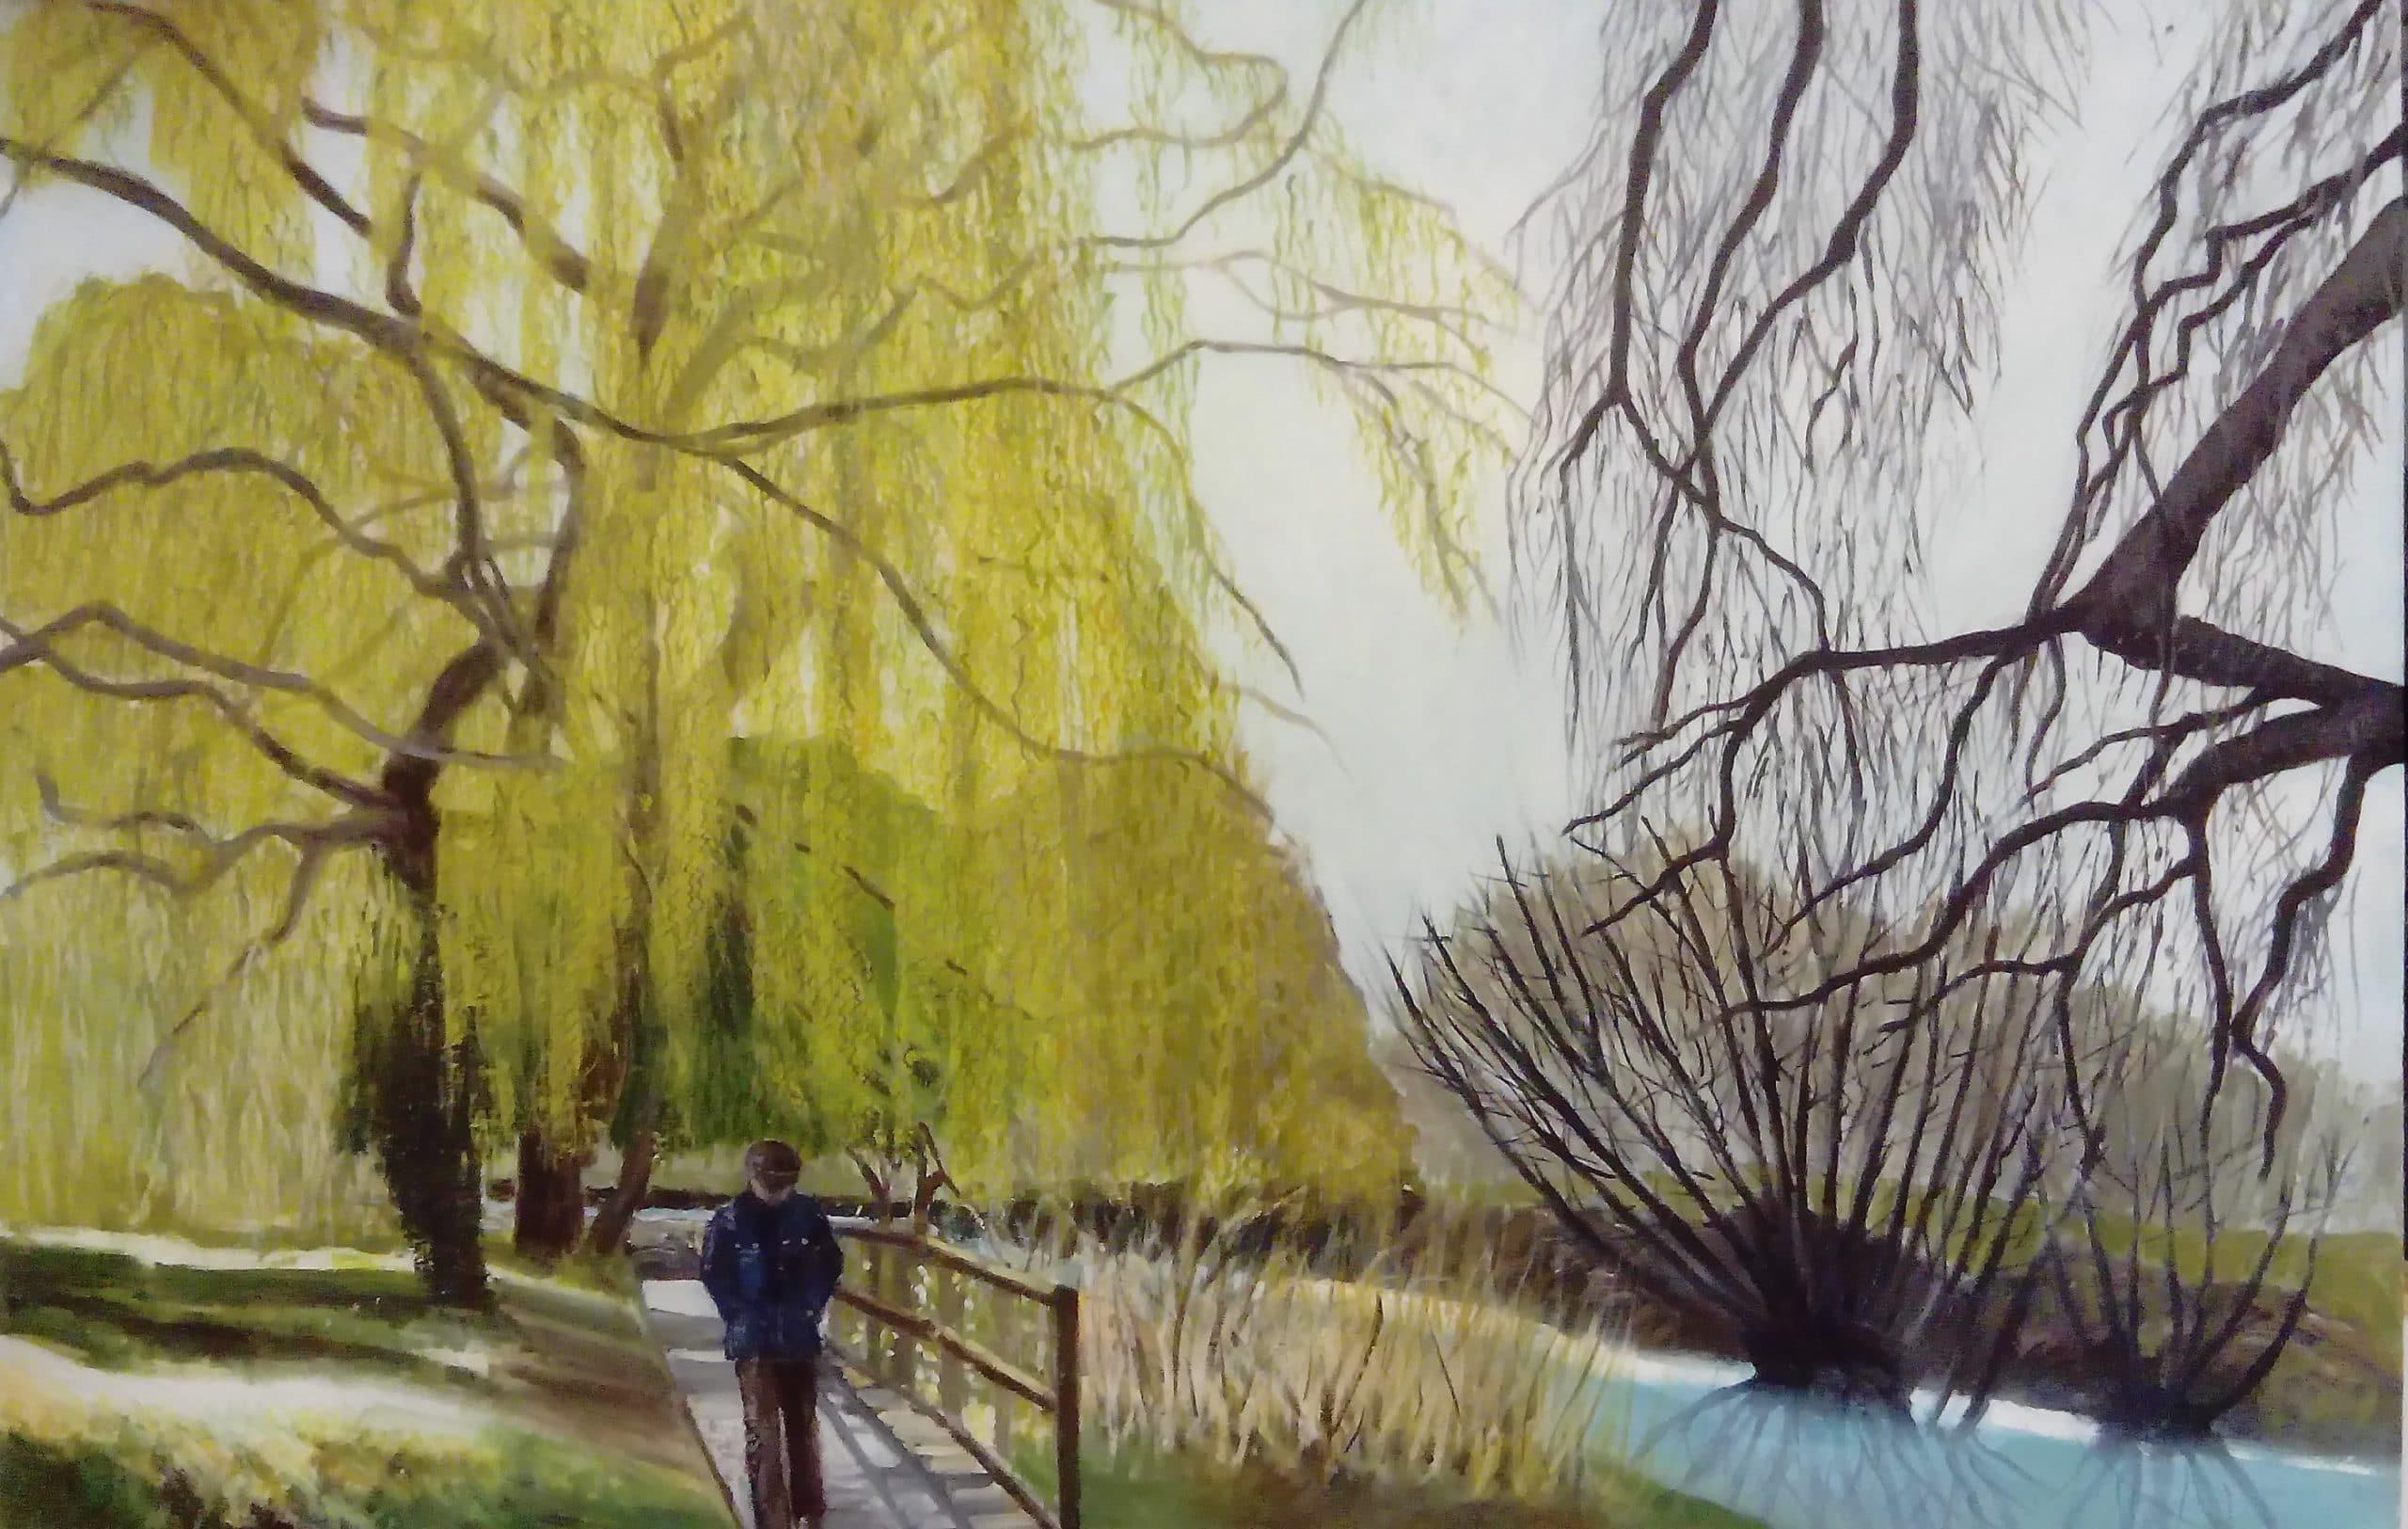 Artwork of a man walking on a bridge